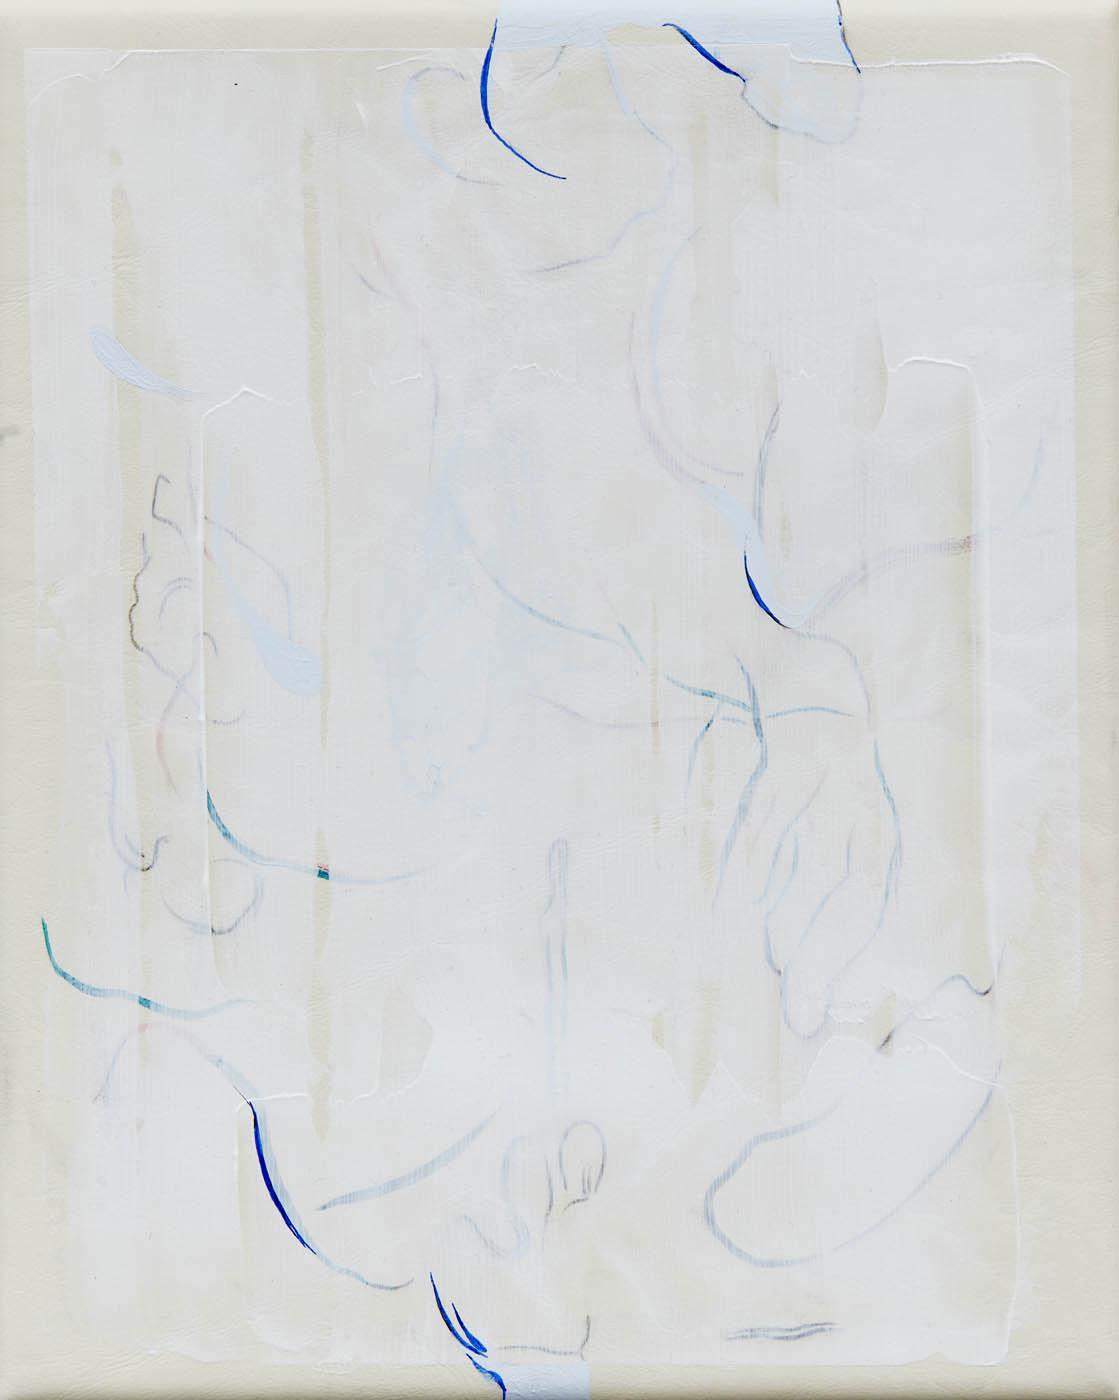 Mayda Karabogdan - Untitled